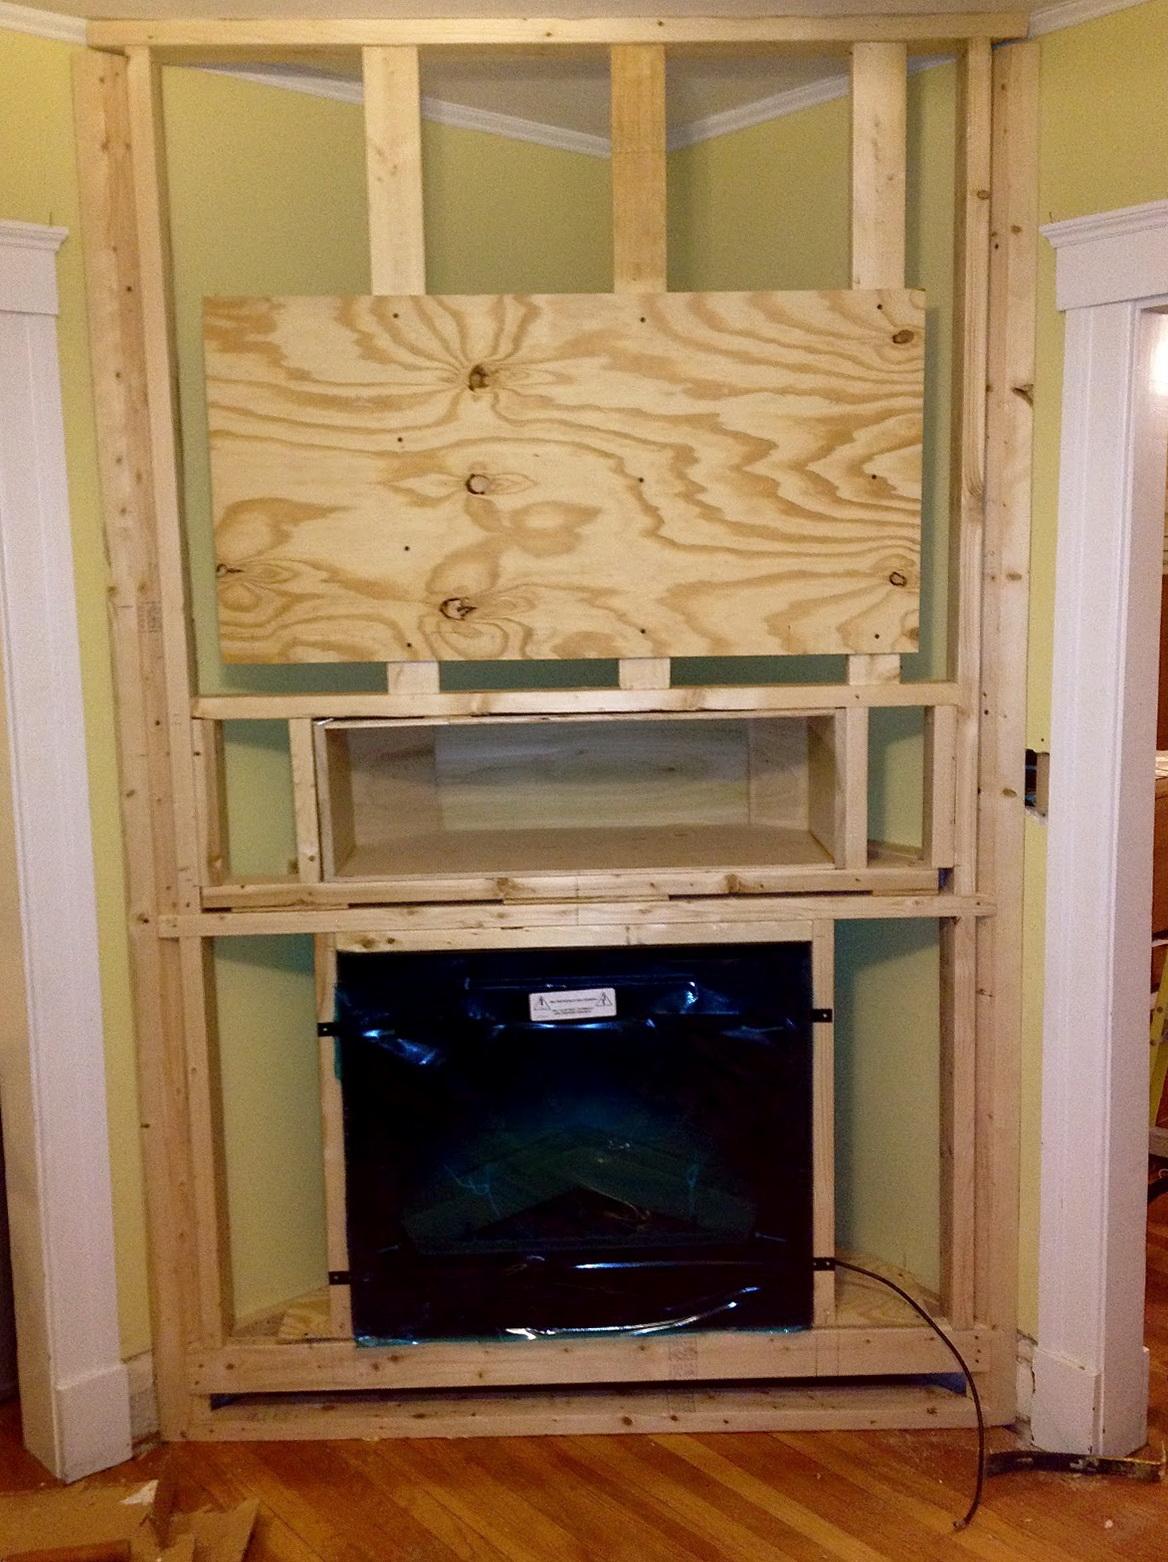 Electric fireplace diy home interior designer today electric fireplace diy solutioingenieria Images